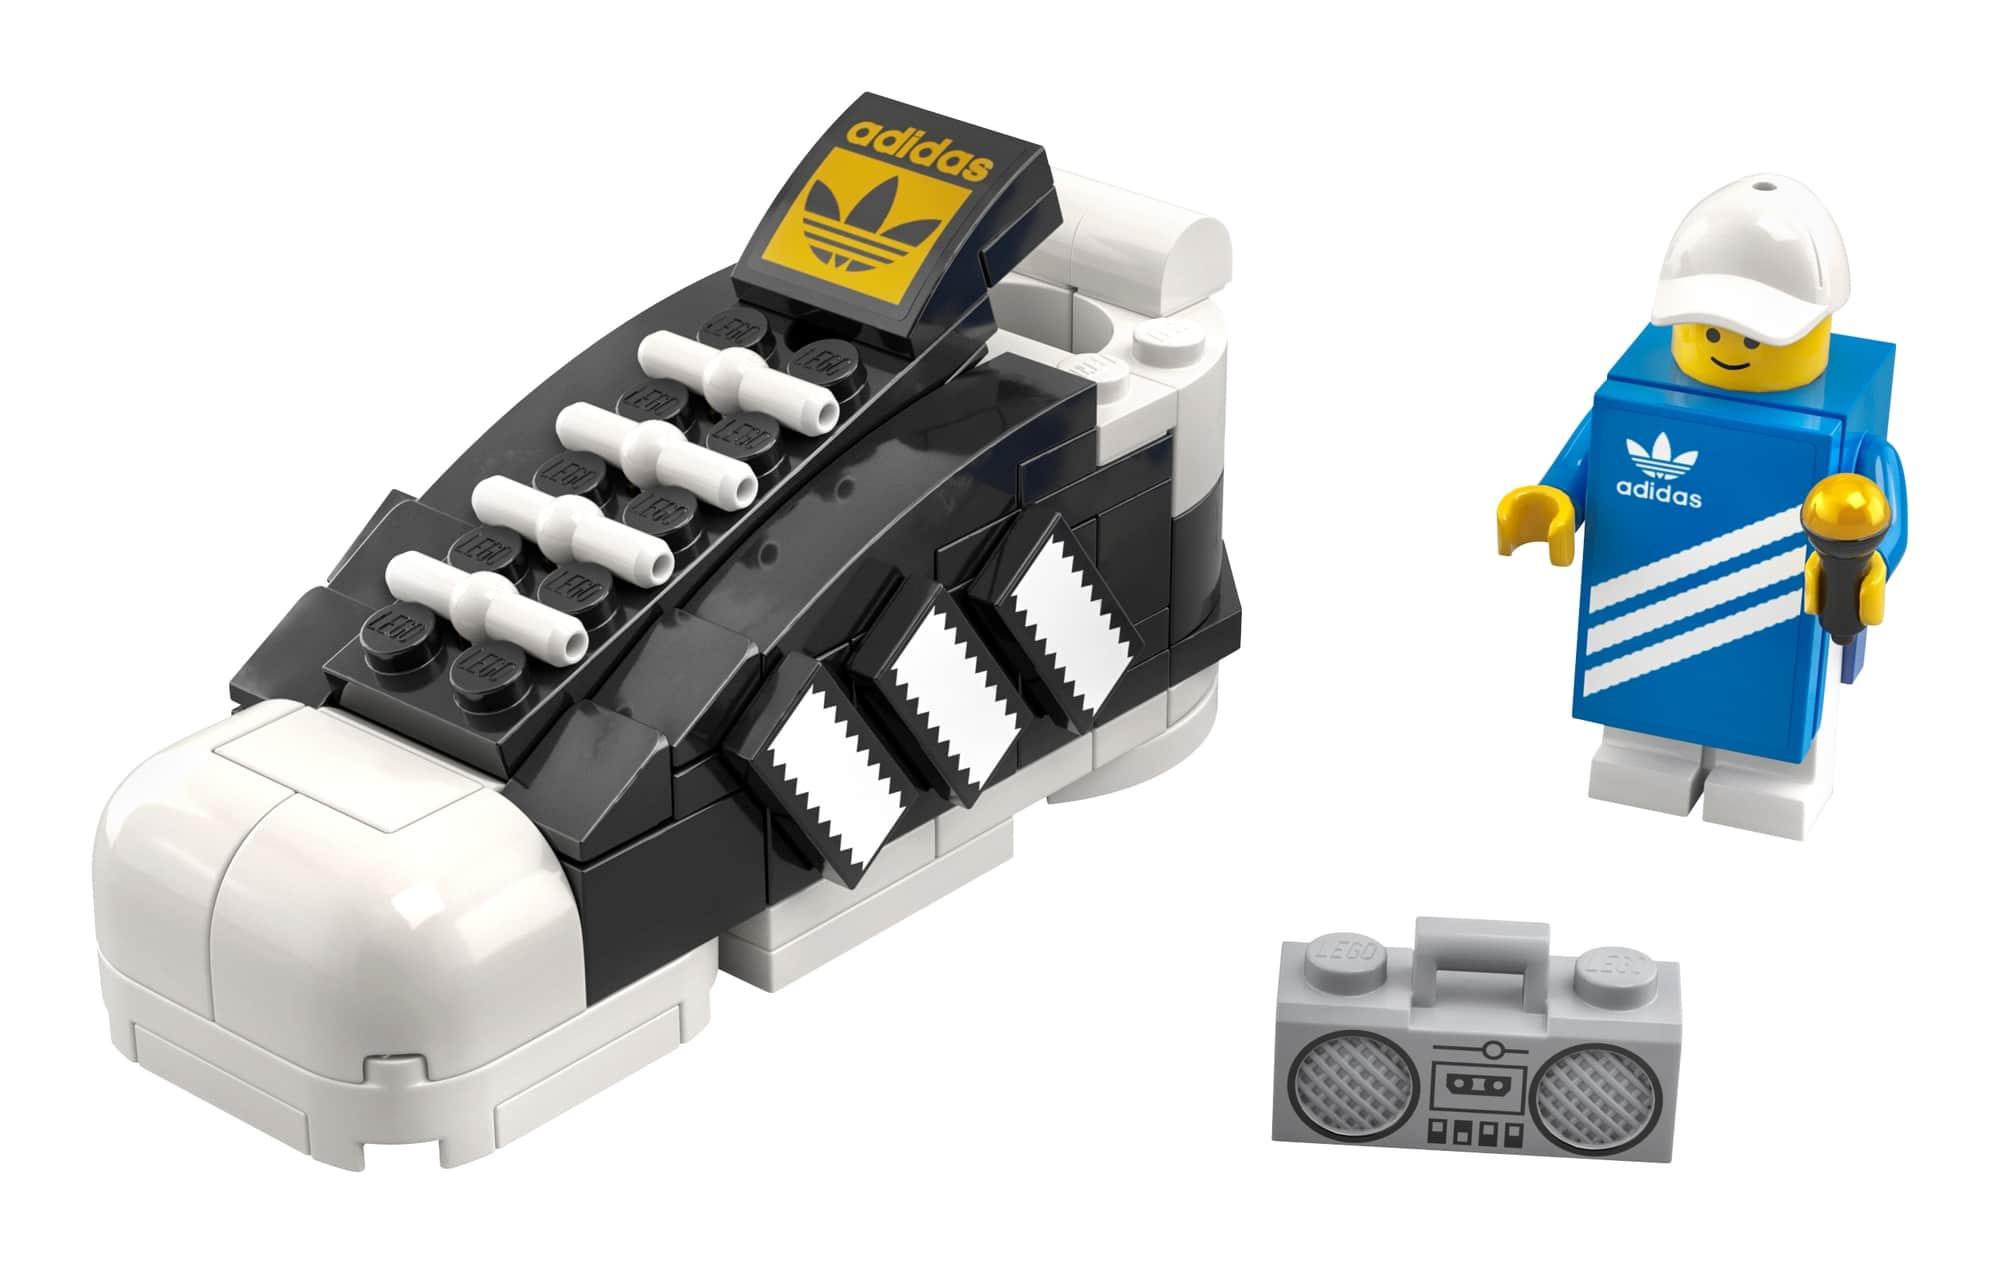 LEGO Miscellaneous 40486 Adidas Originals Superstar 1